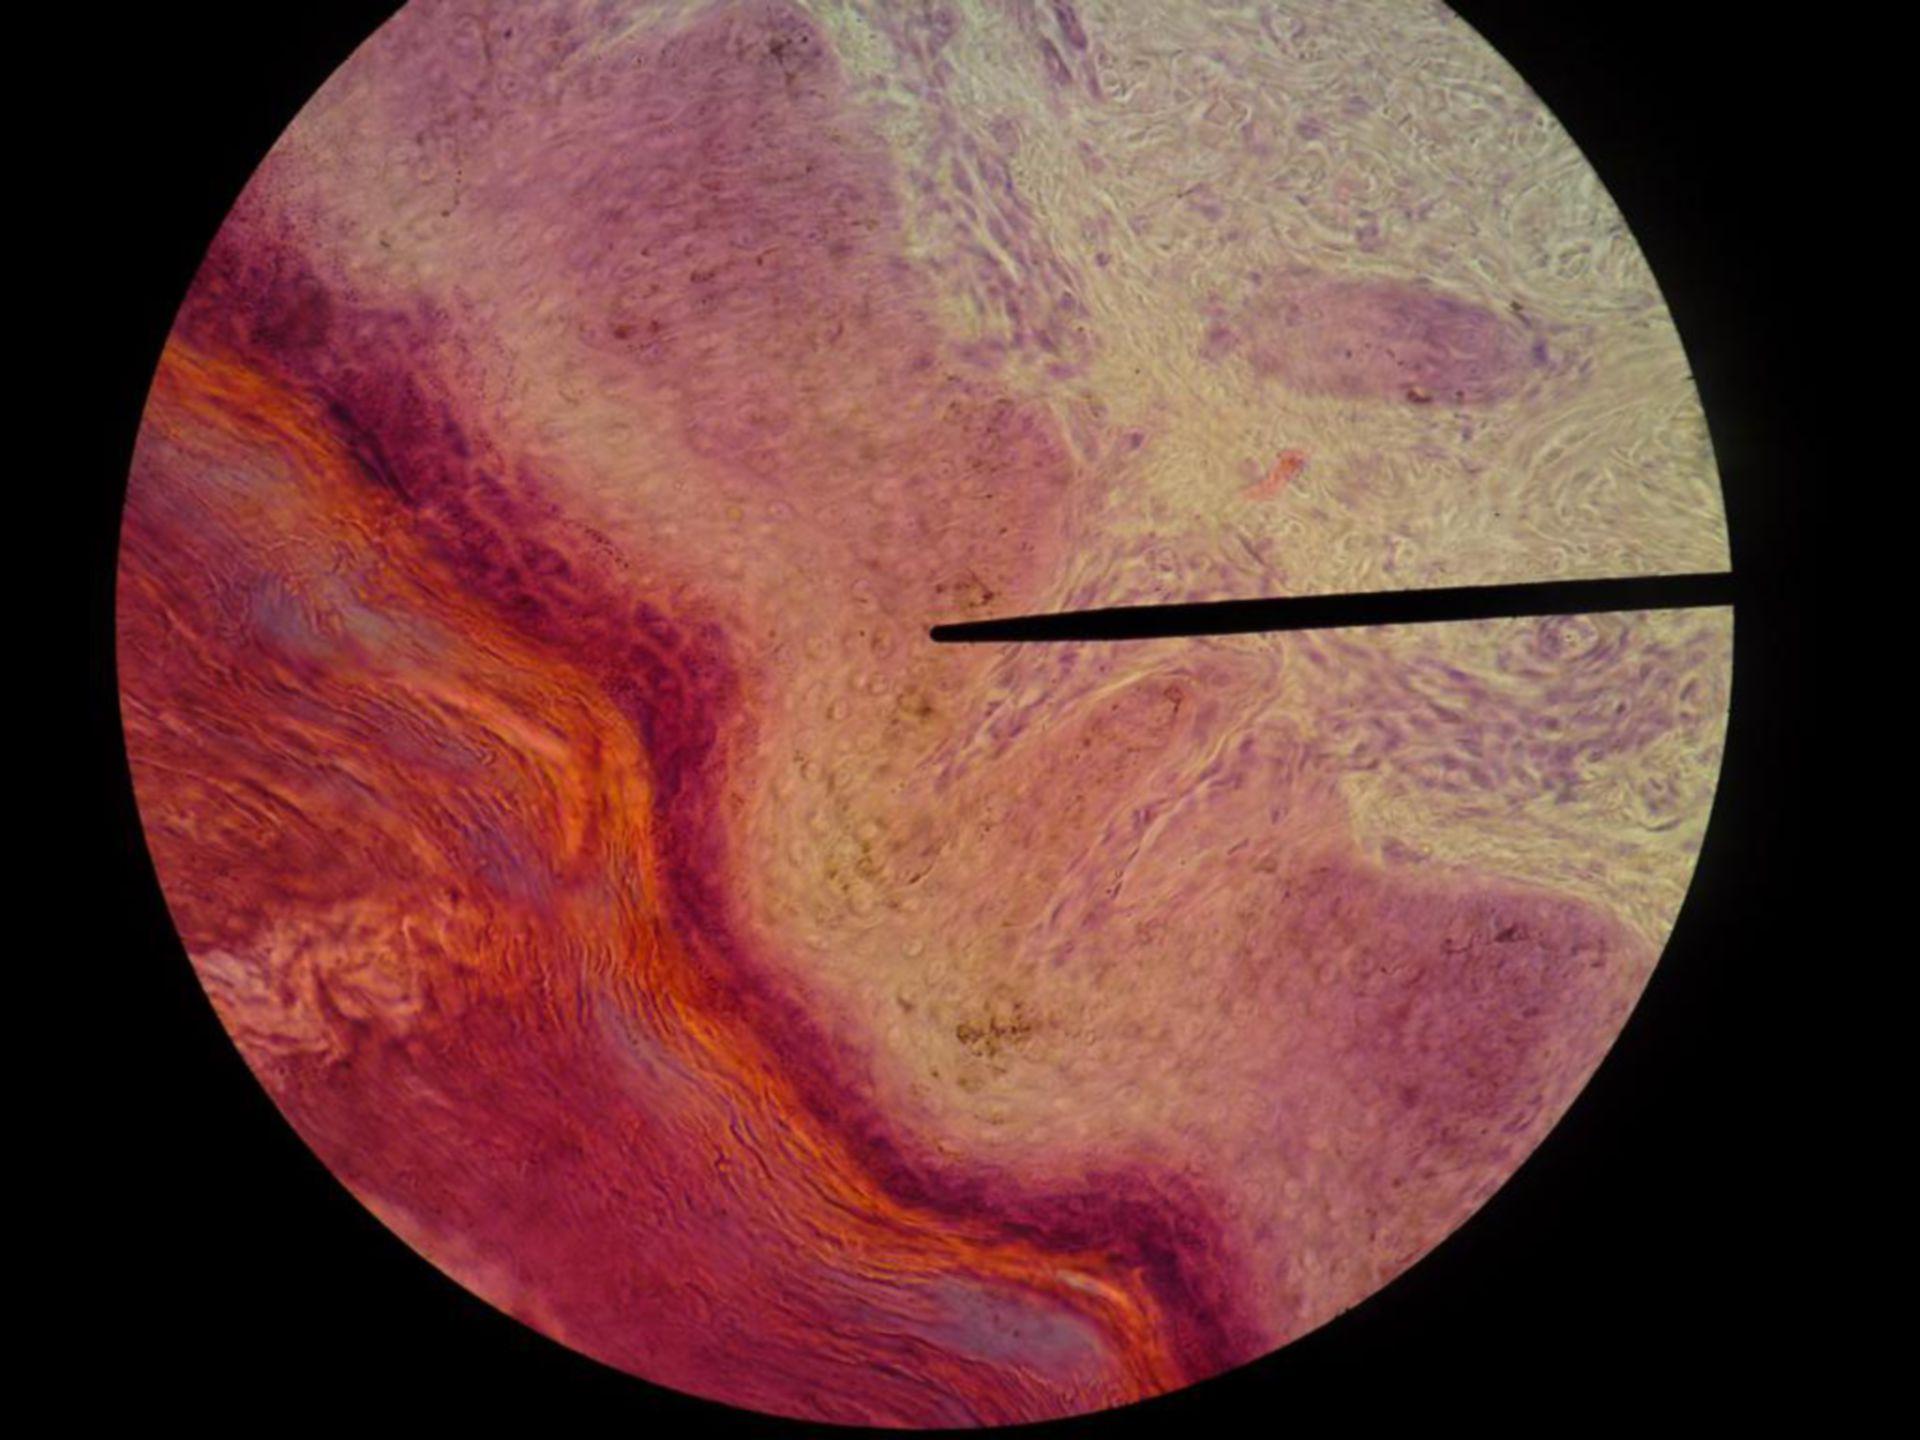 Vehorntes Plattenepithel, subepitheliales Bindegewebe - Sohlenballen Katze